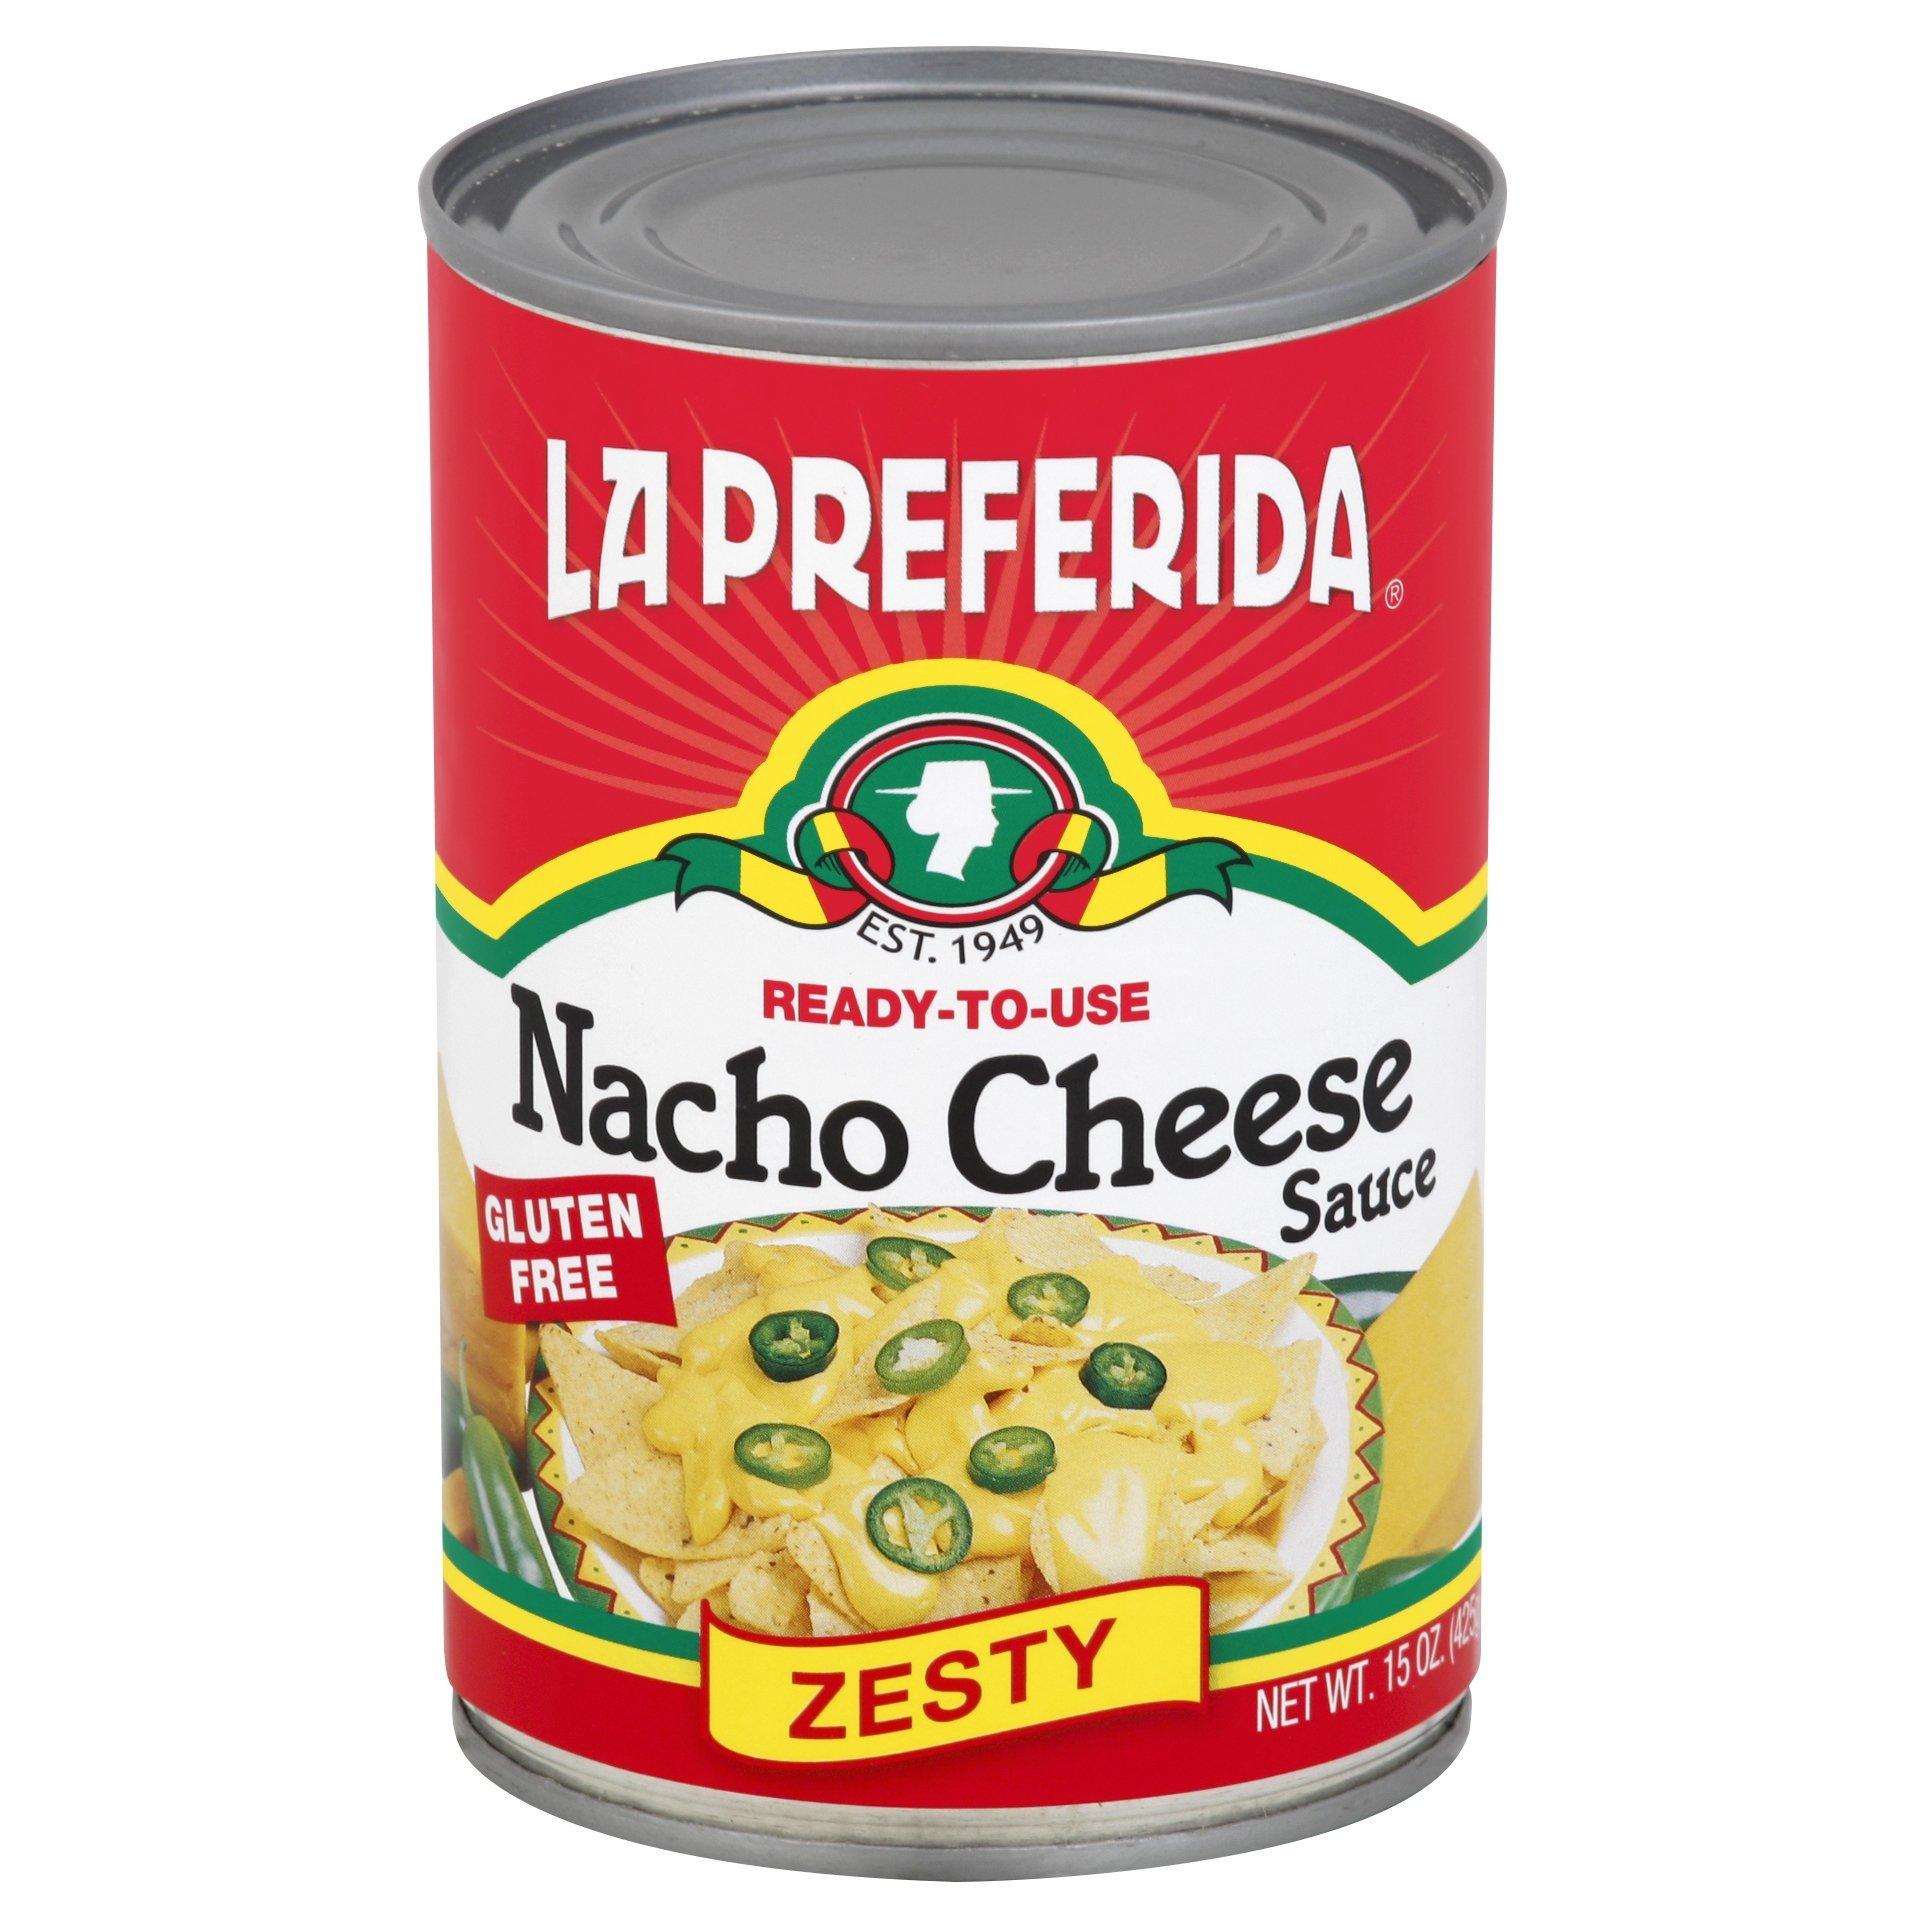 LA PREFERIDA SAUCE NACHO CHS, 15 OZ by LA PREFERIDA (Image #1)